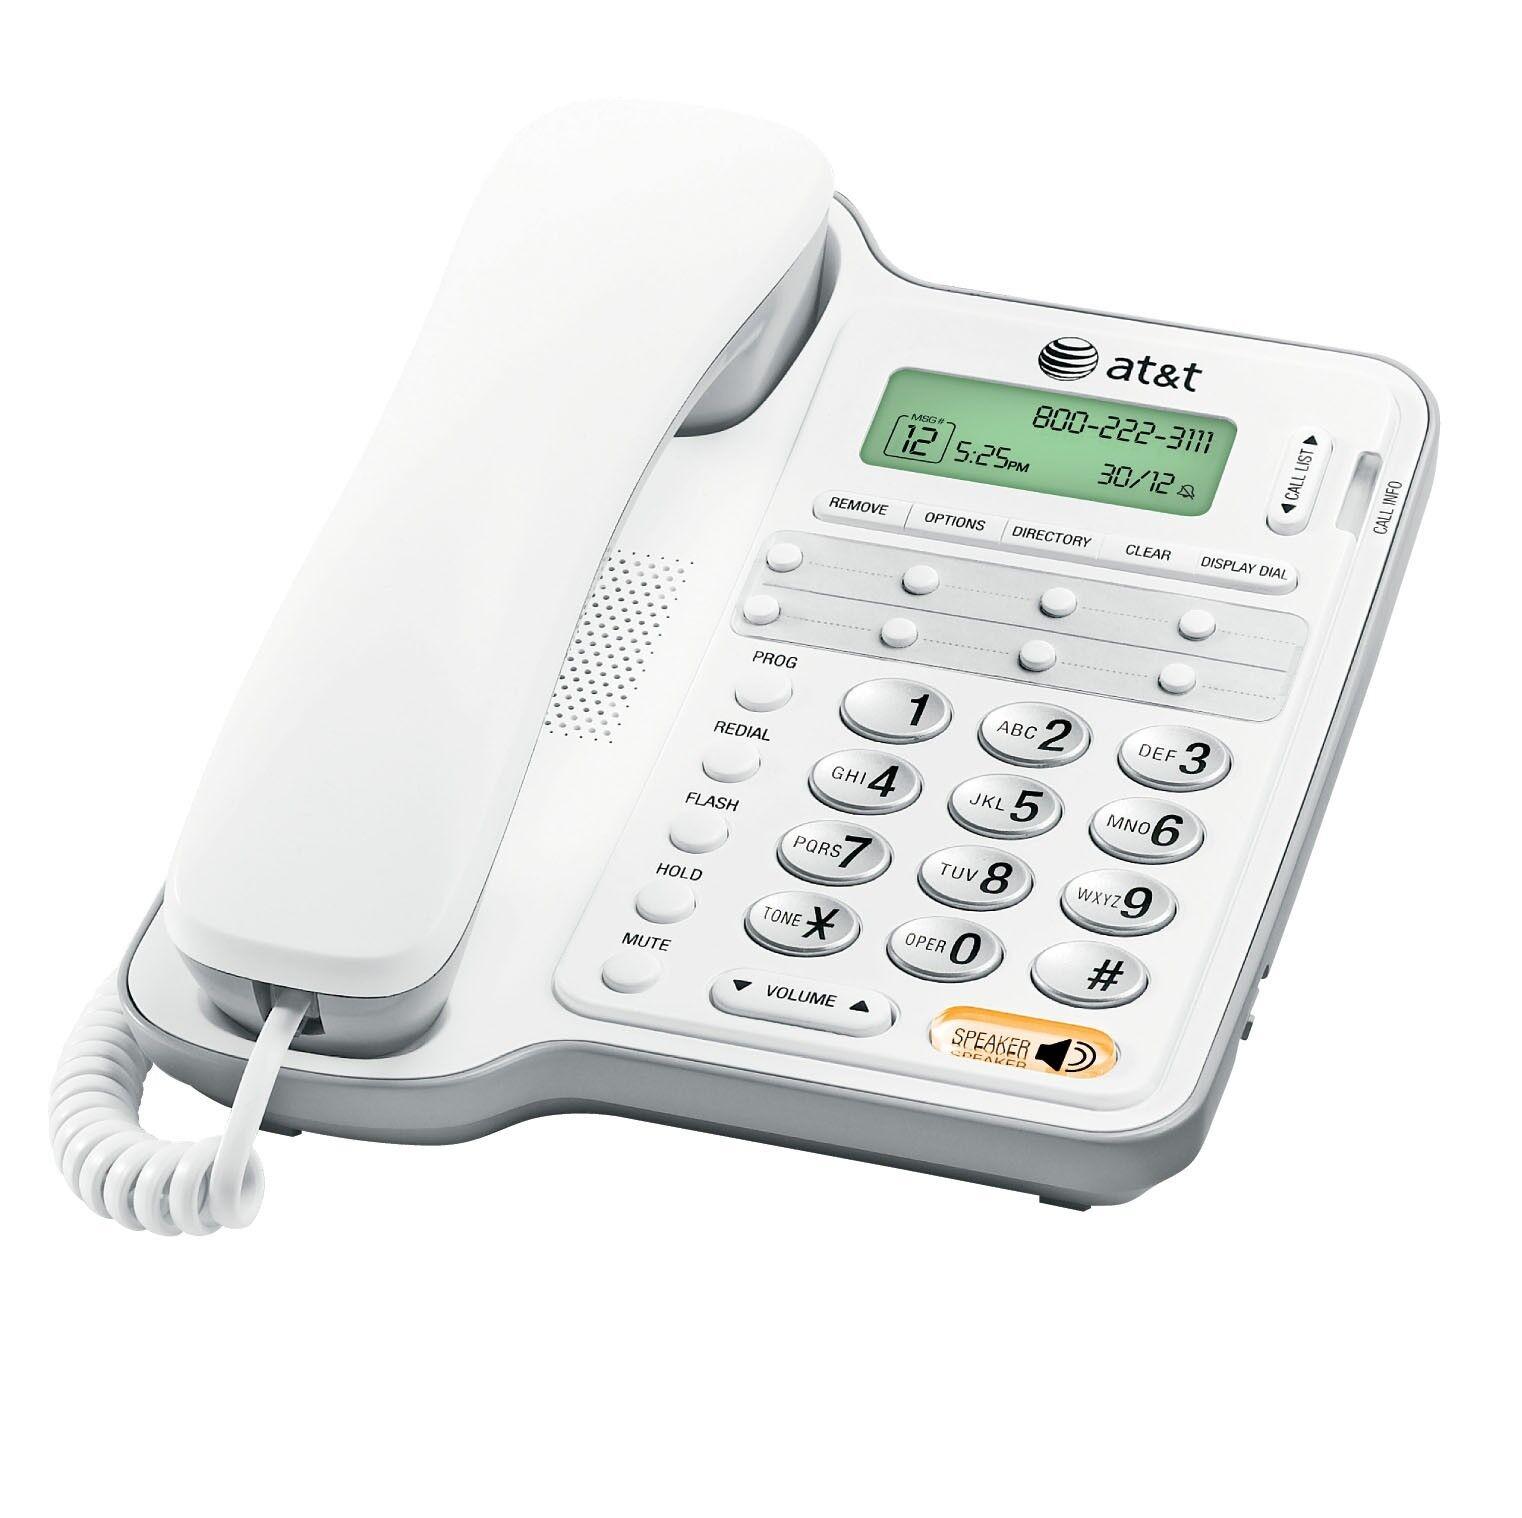 AT&T Att-cl2909 Speakerphone, Caller Id/call Waiting, Wal...